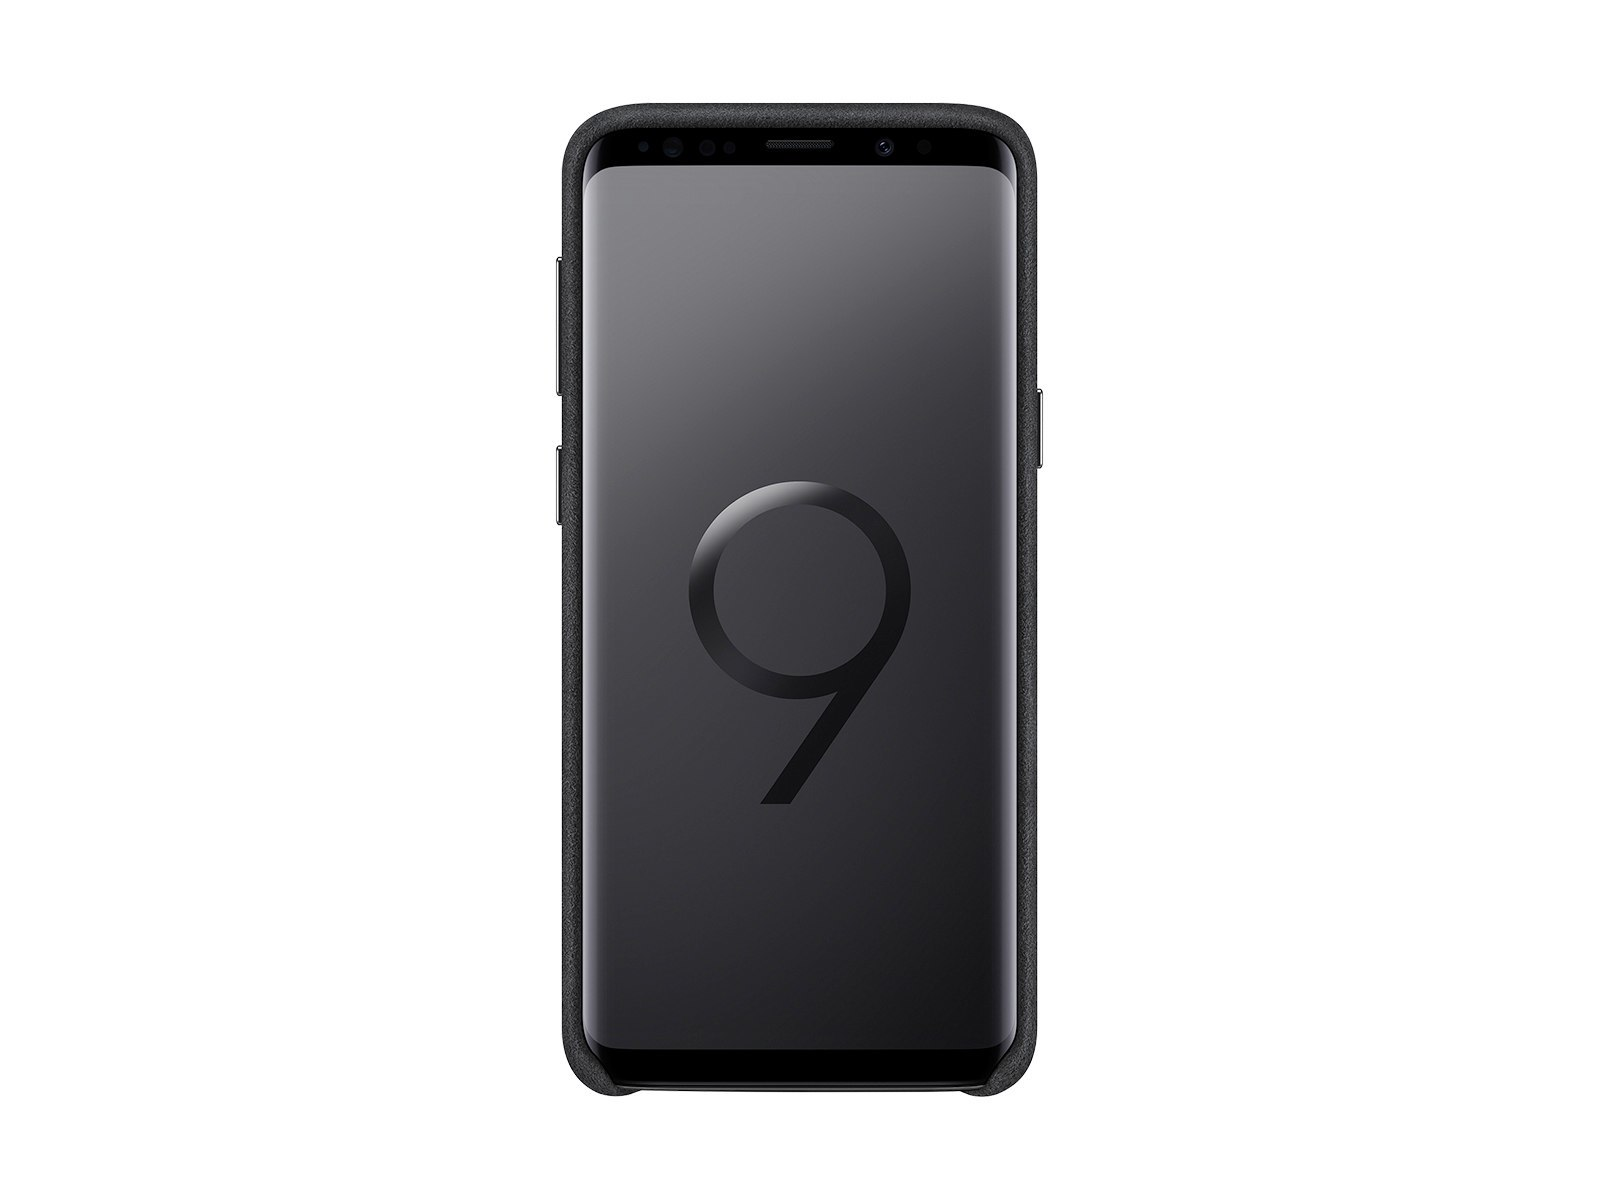 https://i-cdn.phonearena.com/images/articles/317616-image/Samsung-Galaxy-S9-Alcantara-case.jpg